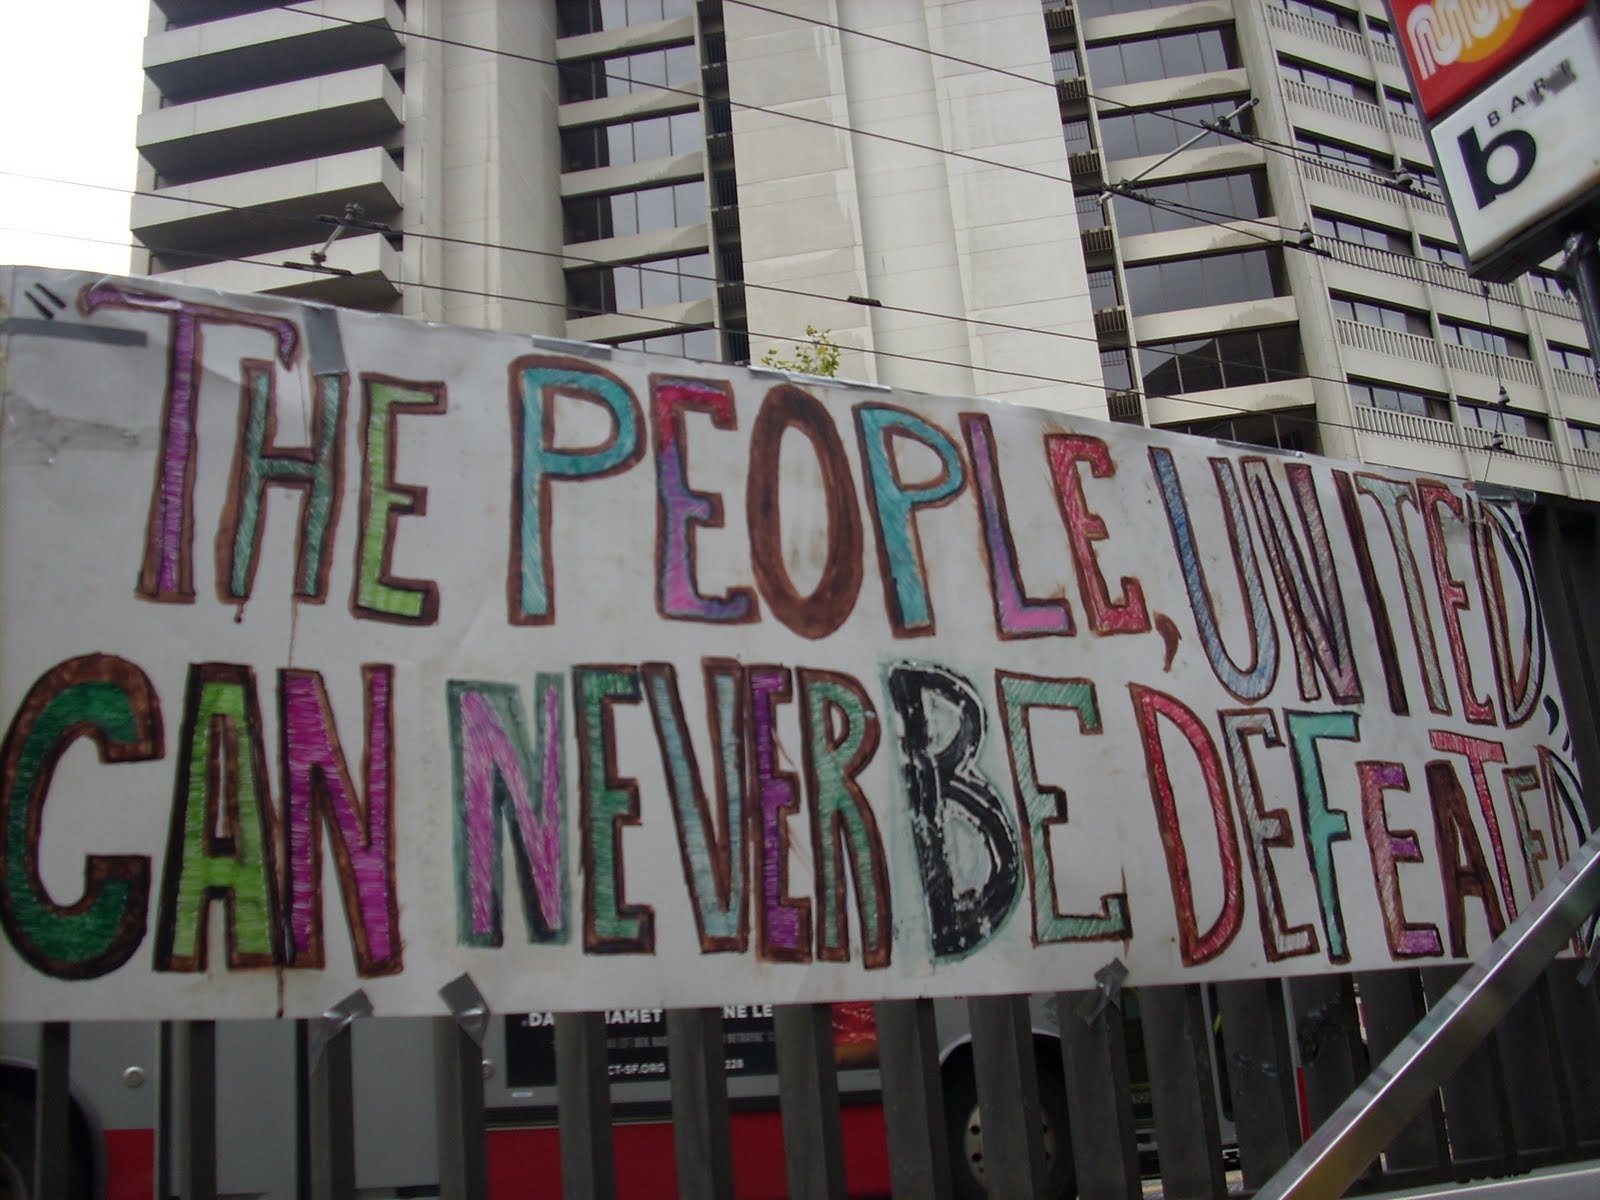 The Free Farm: Occupy gardens